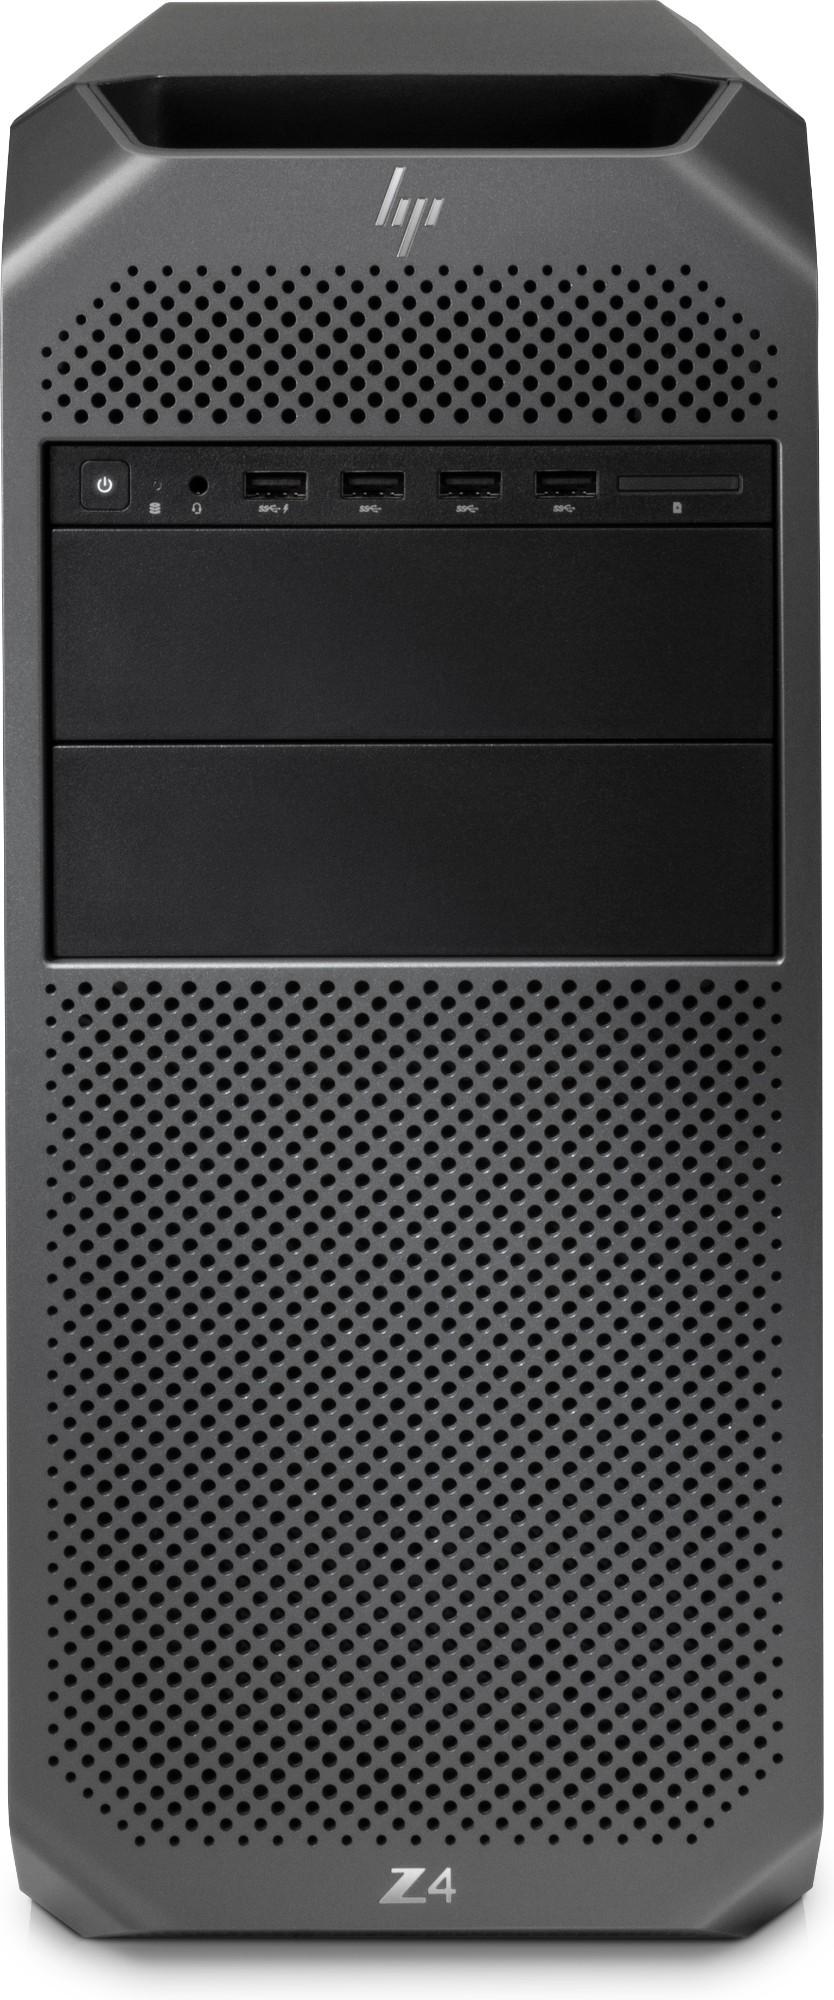 HP Z4 G4 Intel® Xeon® W-2125 16 GB DDR4-SDRAM 1256 GB HDD+SSD Mini Tower Black Workstation Windows 10 Pro